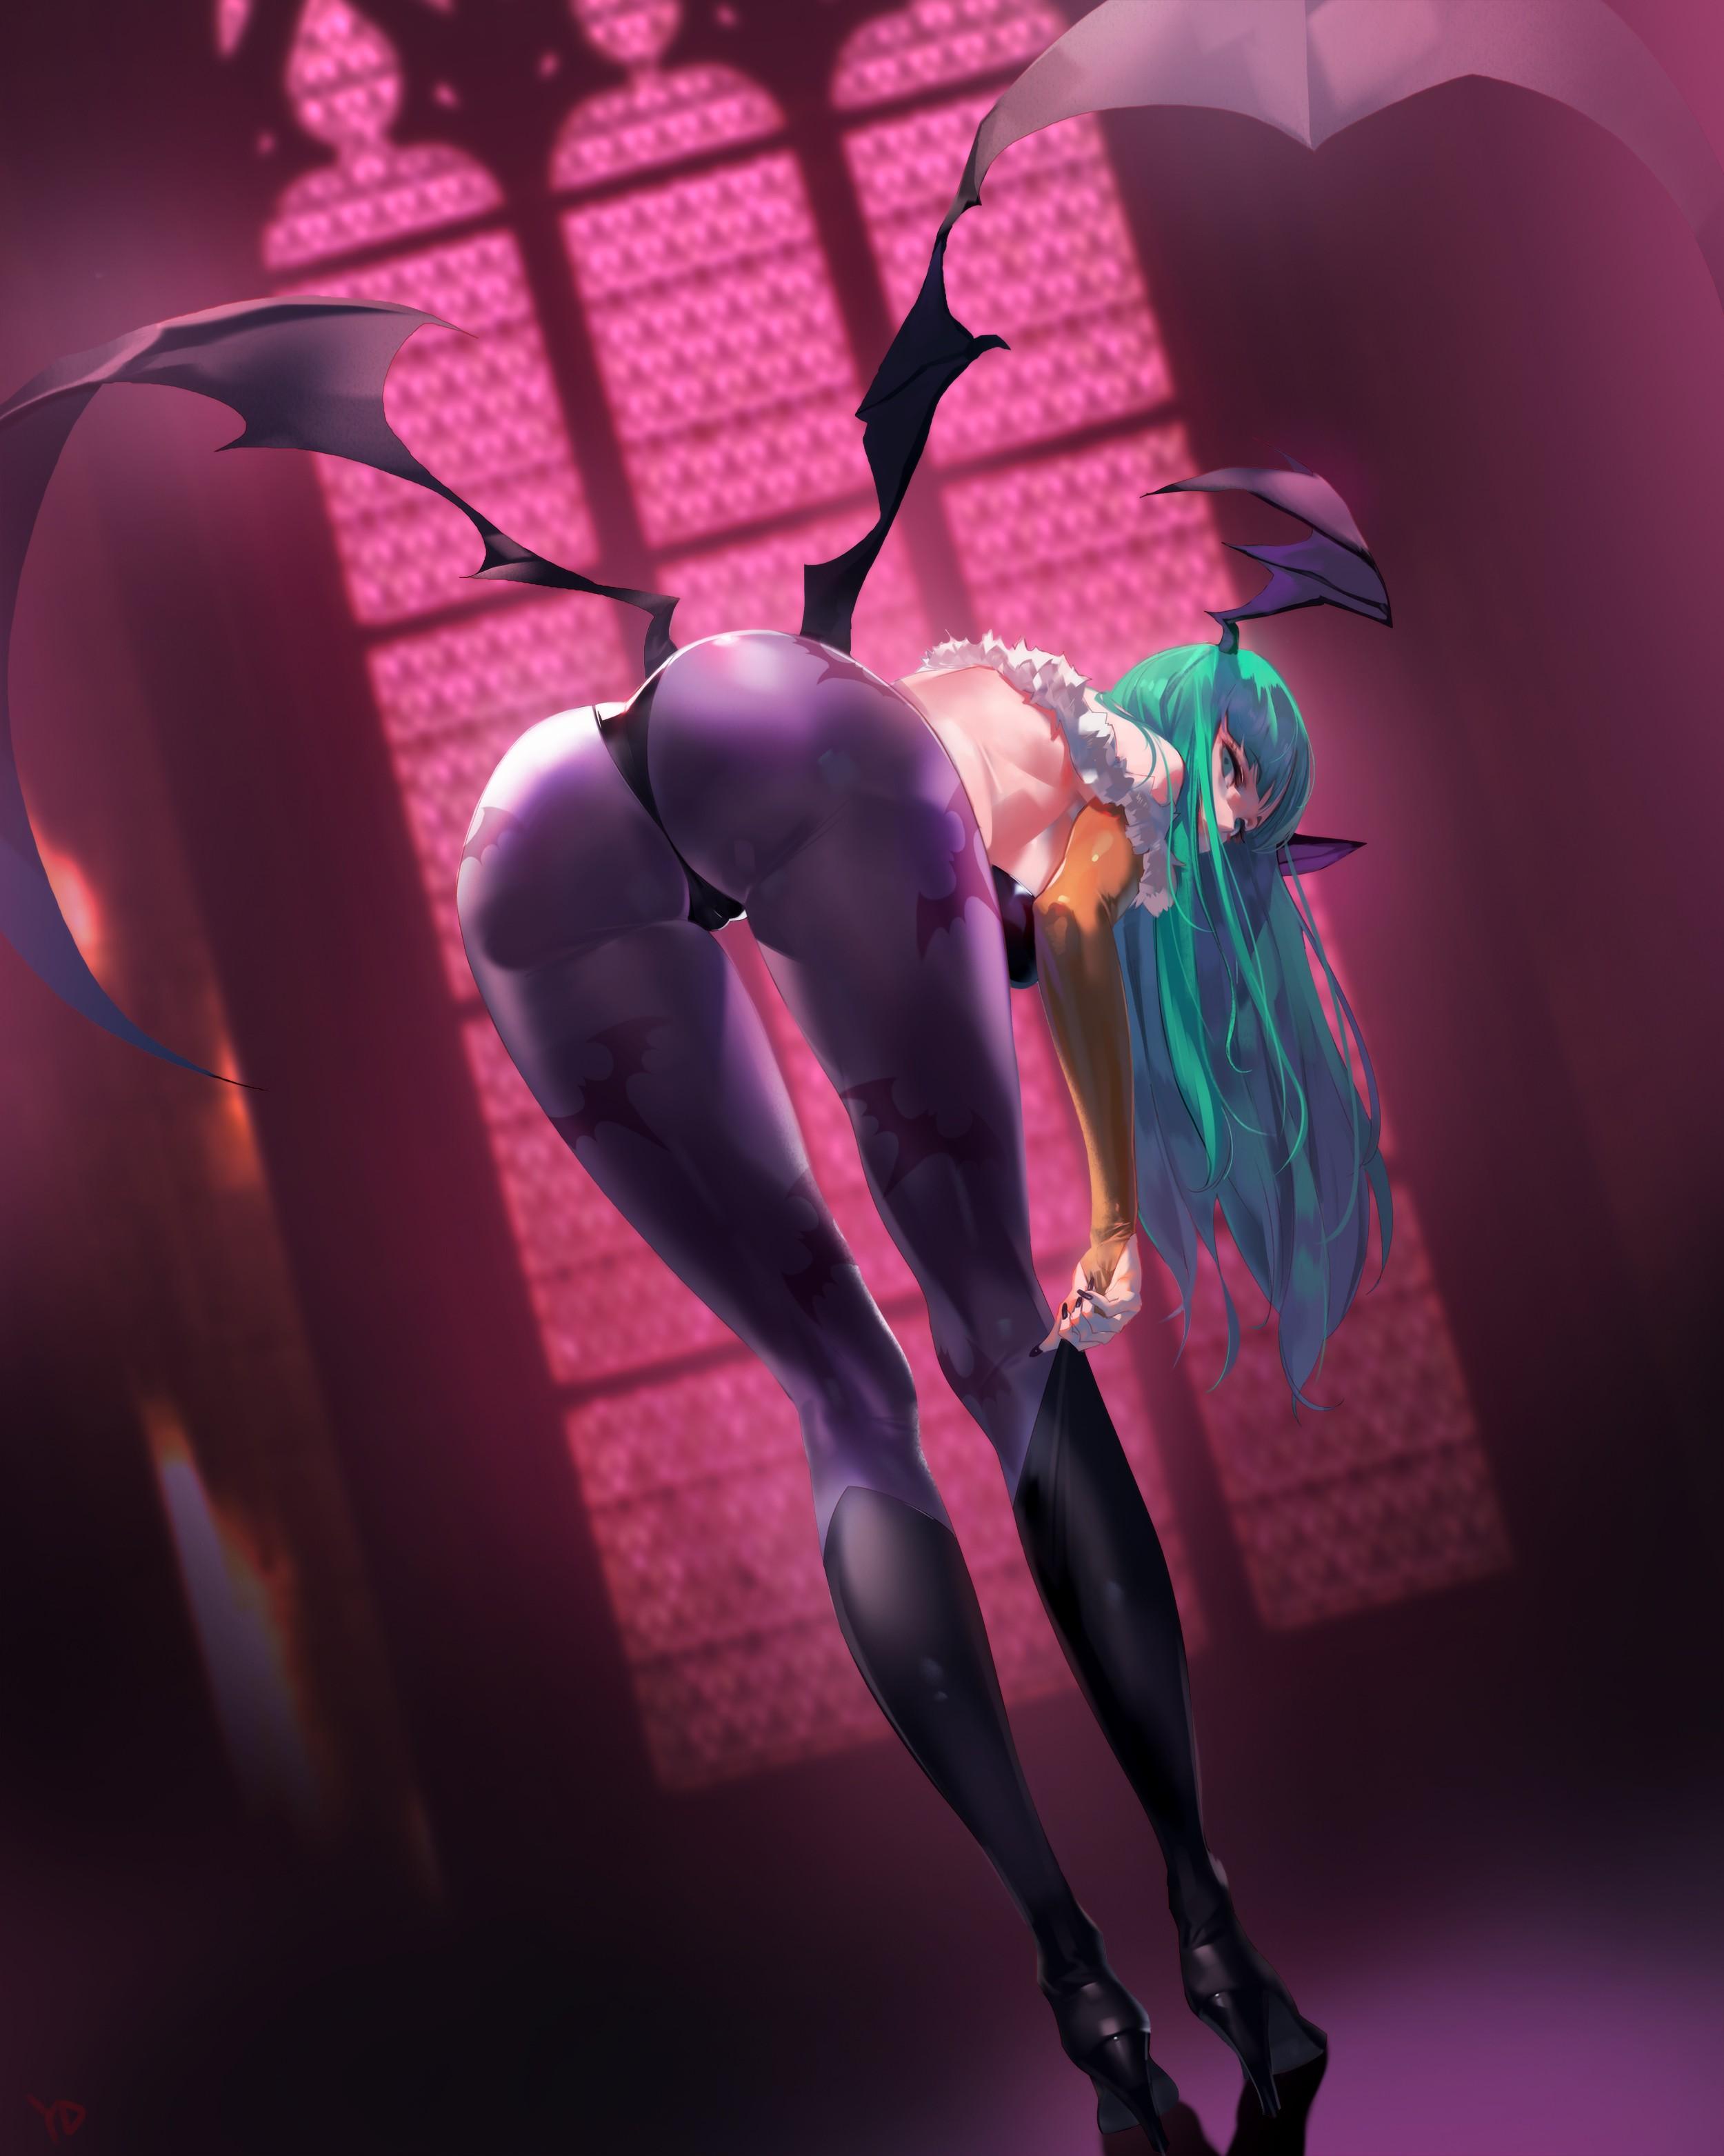 Ecchi Anime Demon Girl Wallpaper Android Wallpaper Anime Girls Ass Wings No Bra Heels